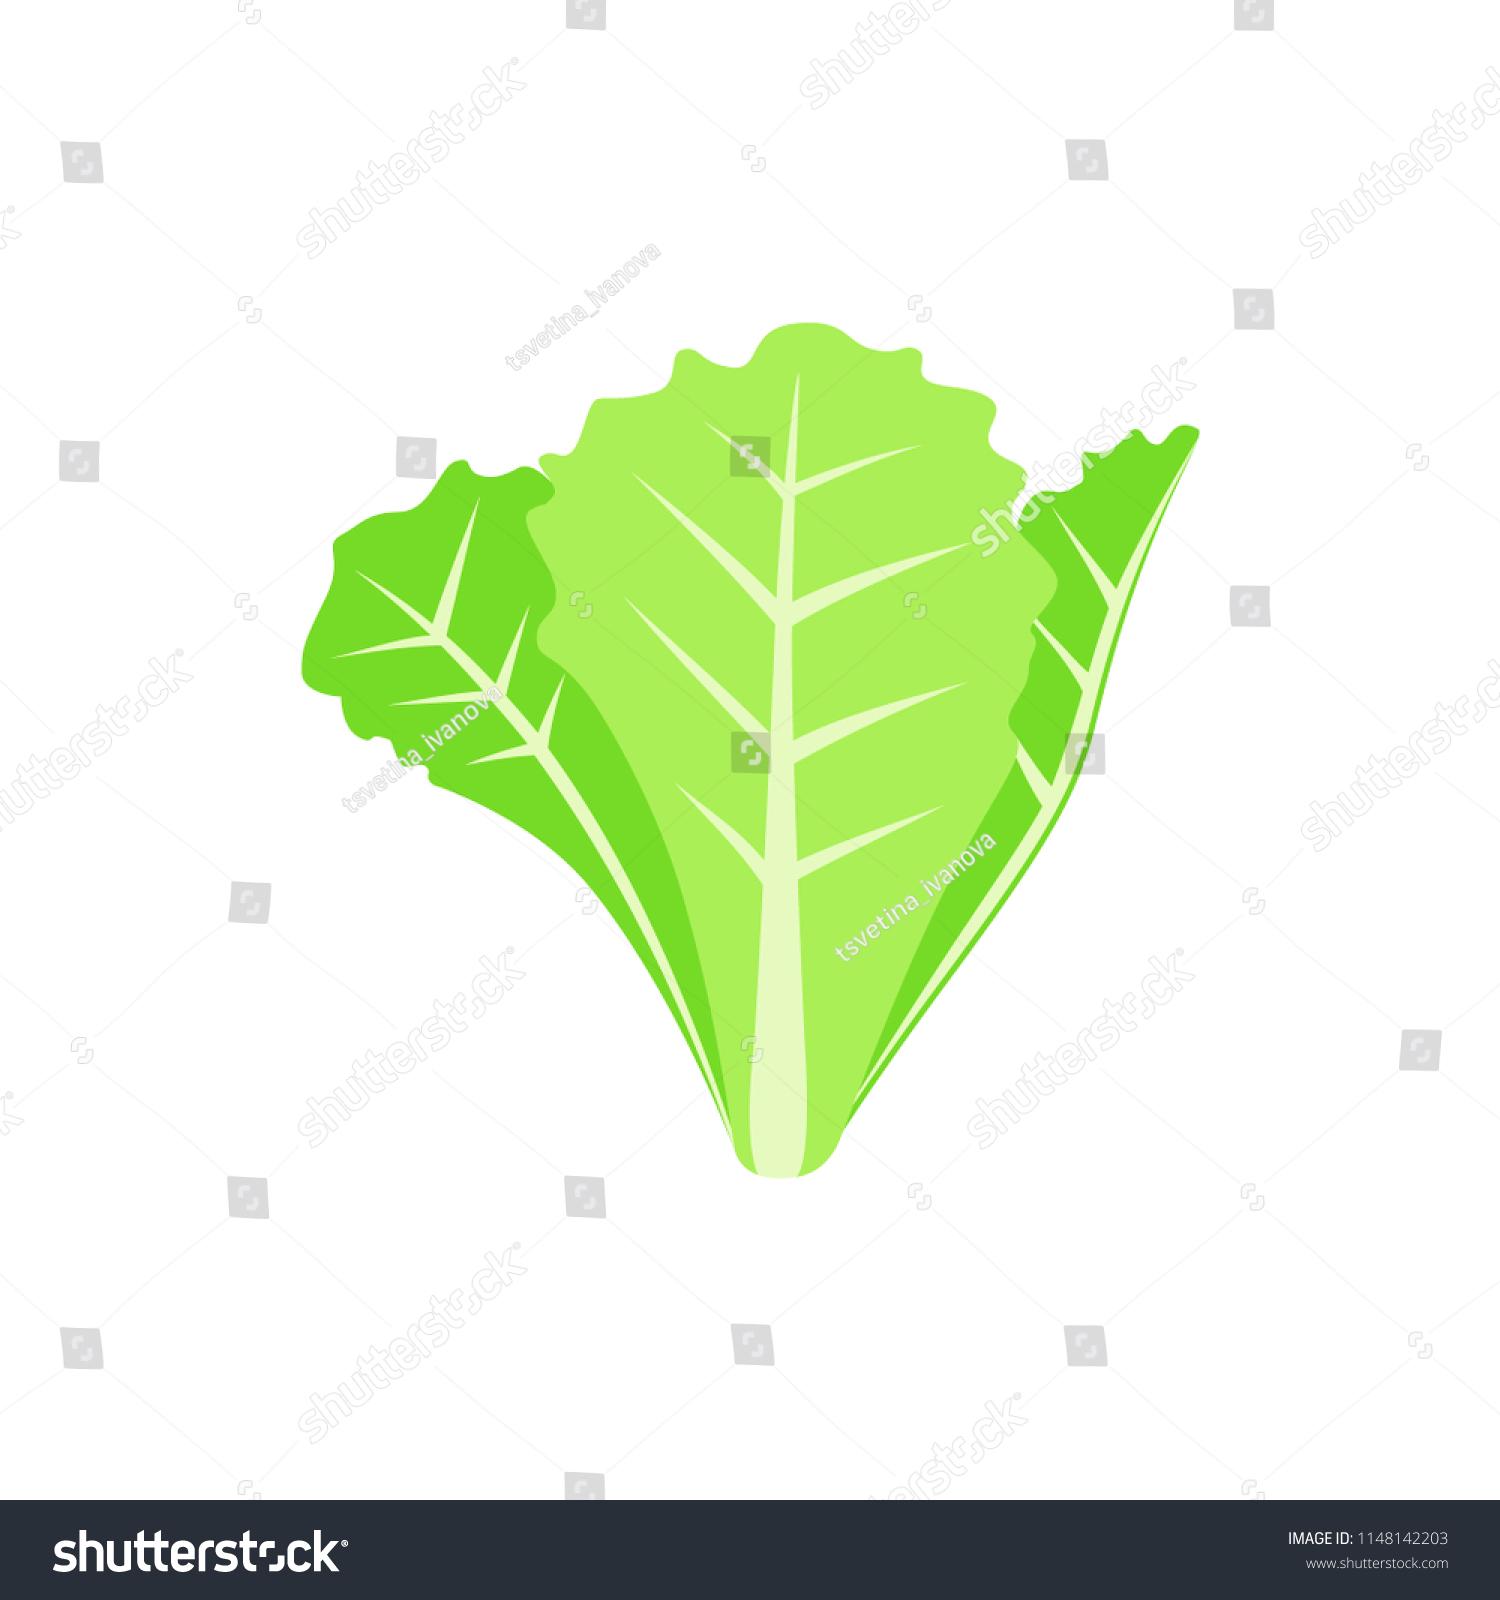 14+ Lettuce Clipart - Preview : Lettuce Clipart L | HDClipartAll